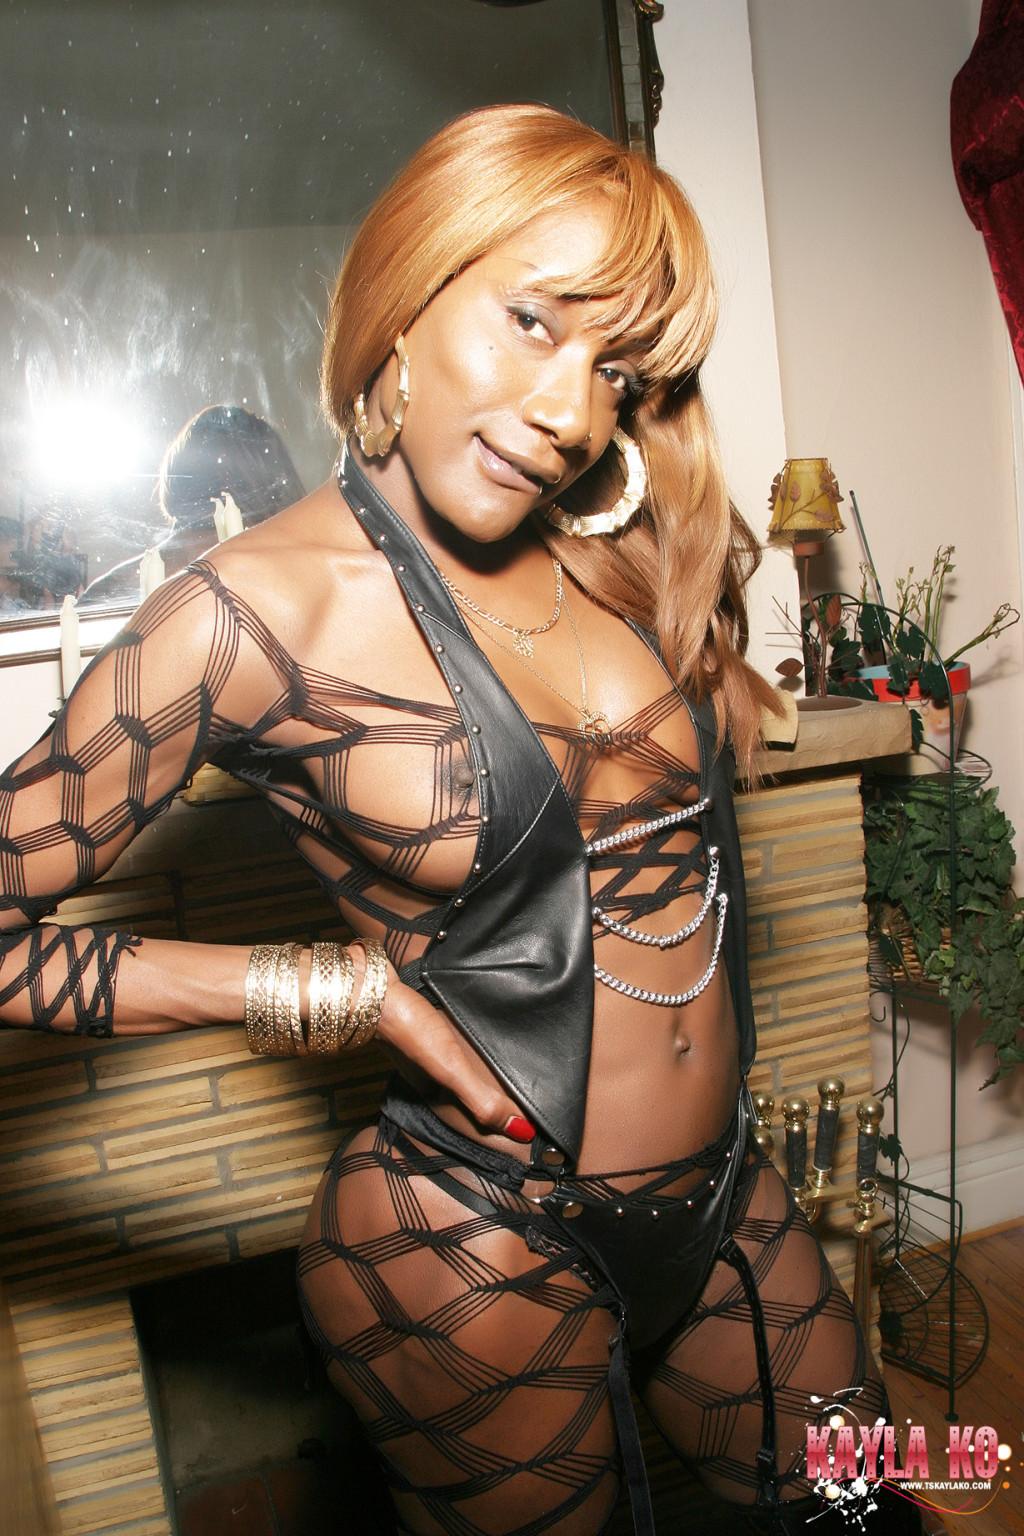 Large Shemale Kayla K O - Shemale Kayla KO in fishnet body stocking - Pichunter